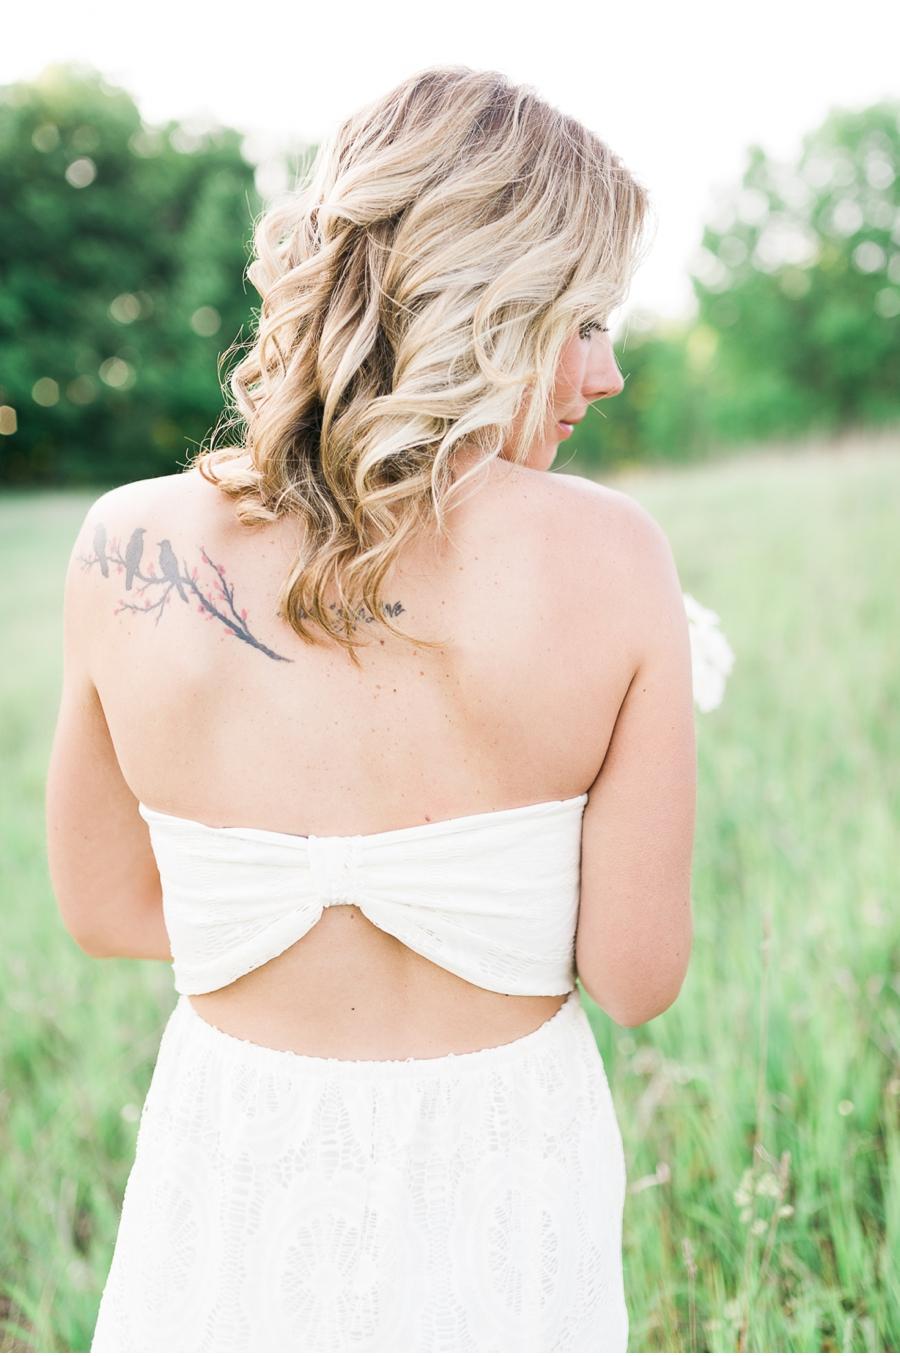 White-Dress-Cut-Out-Back